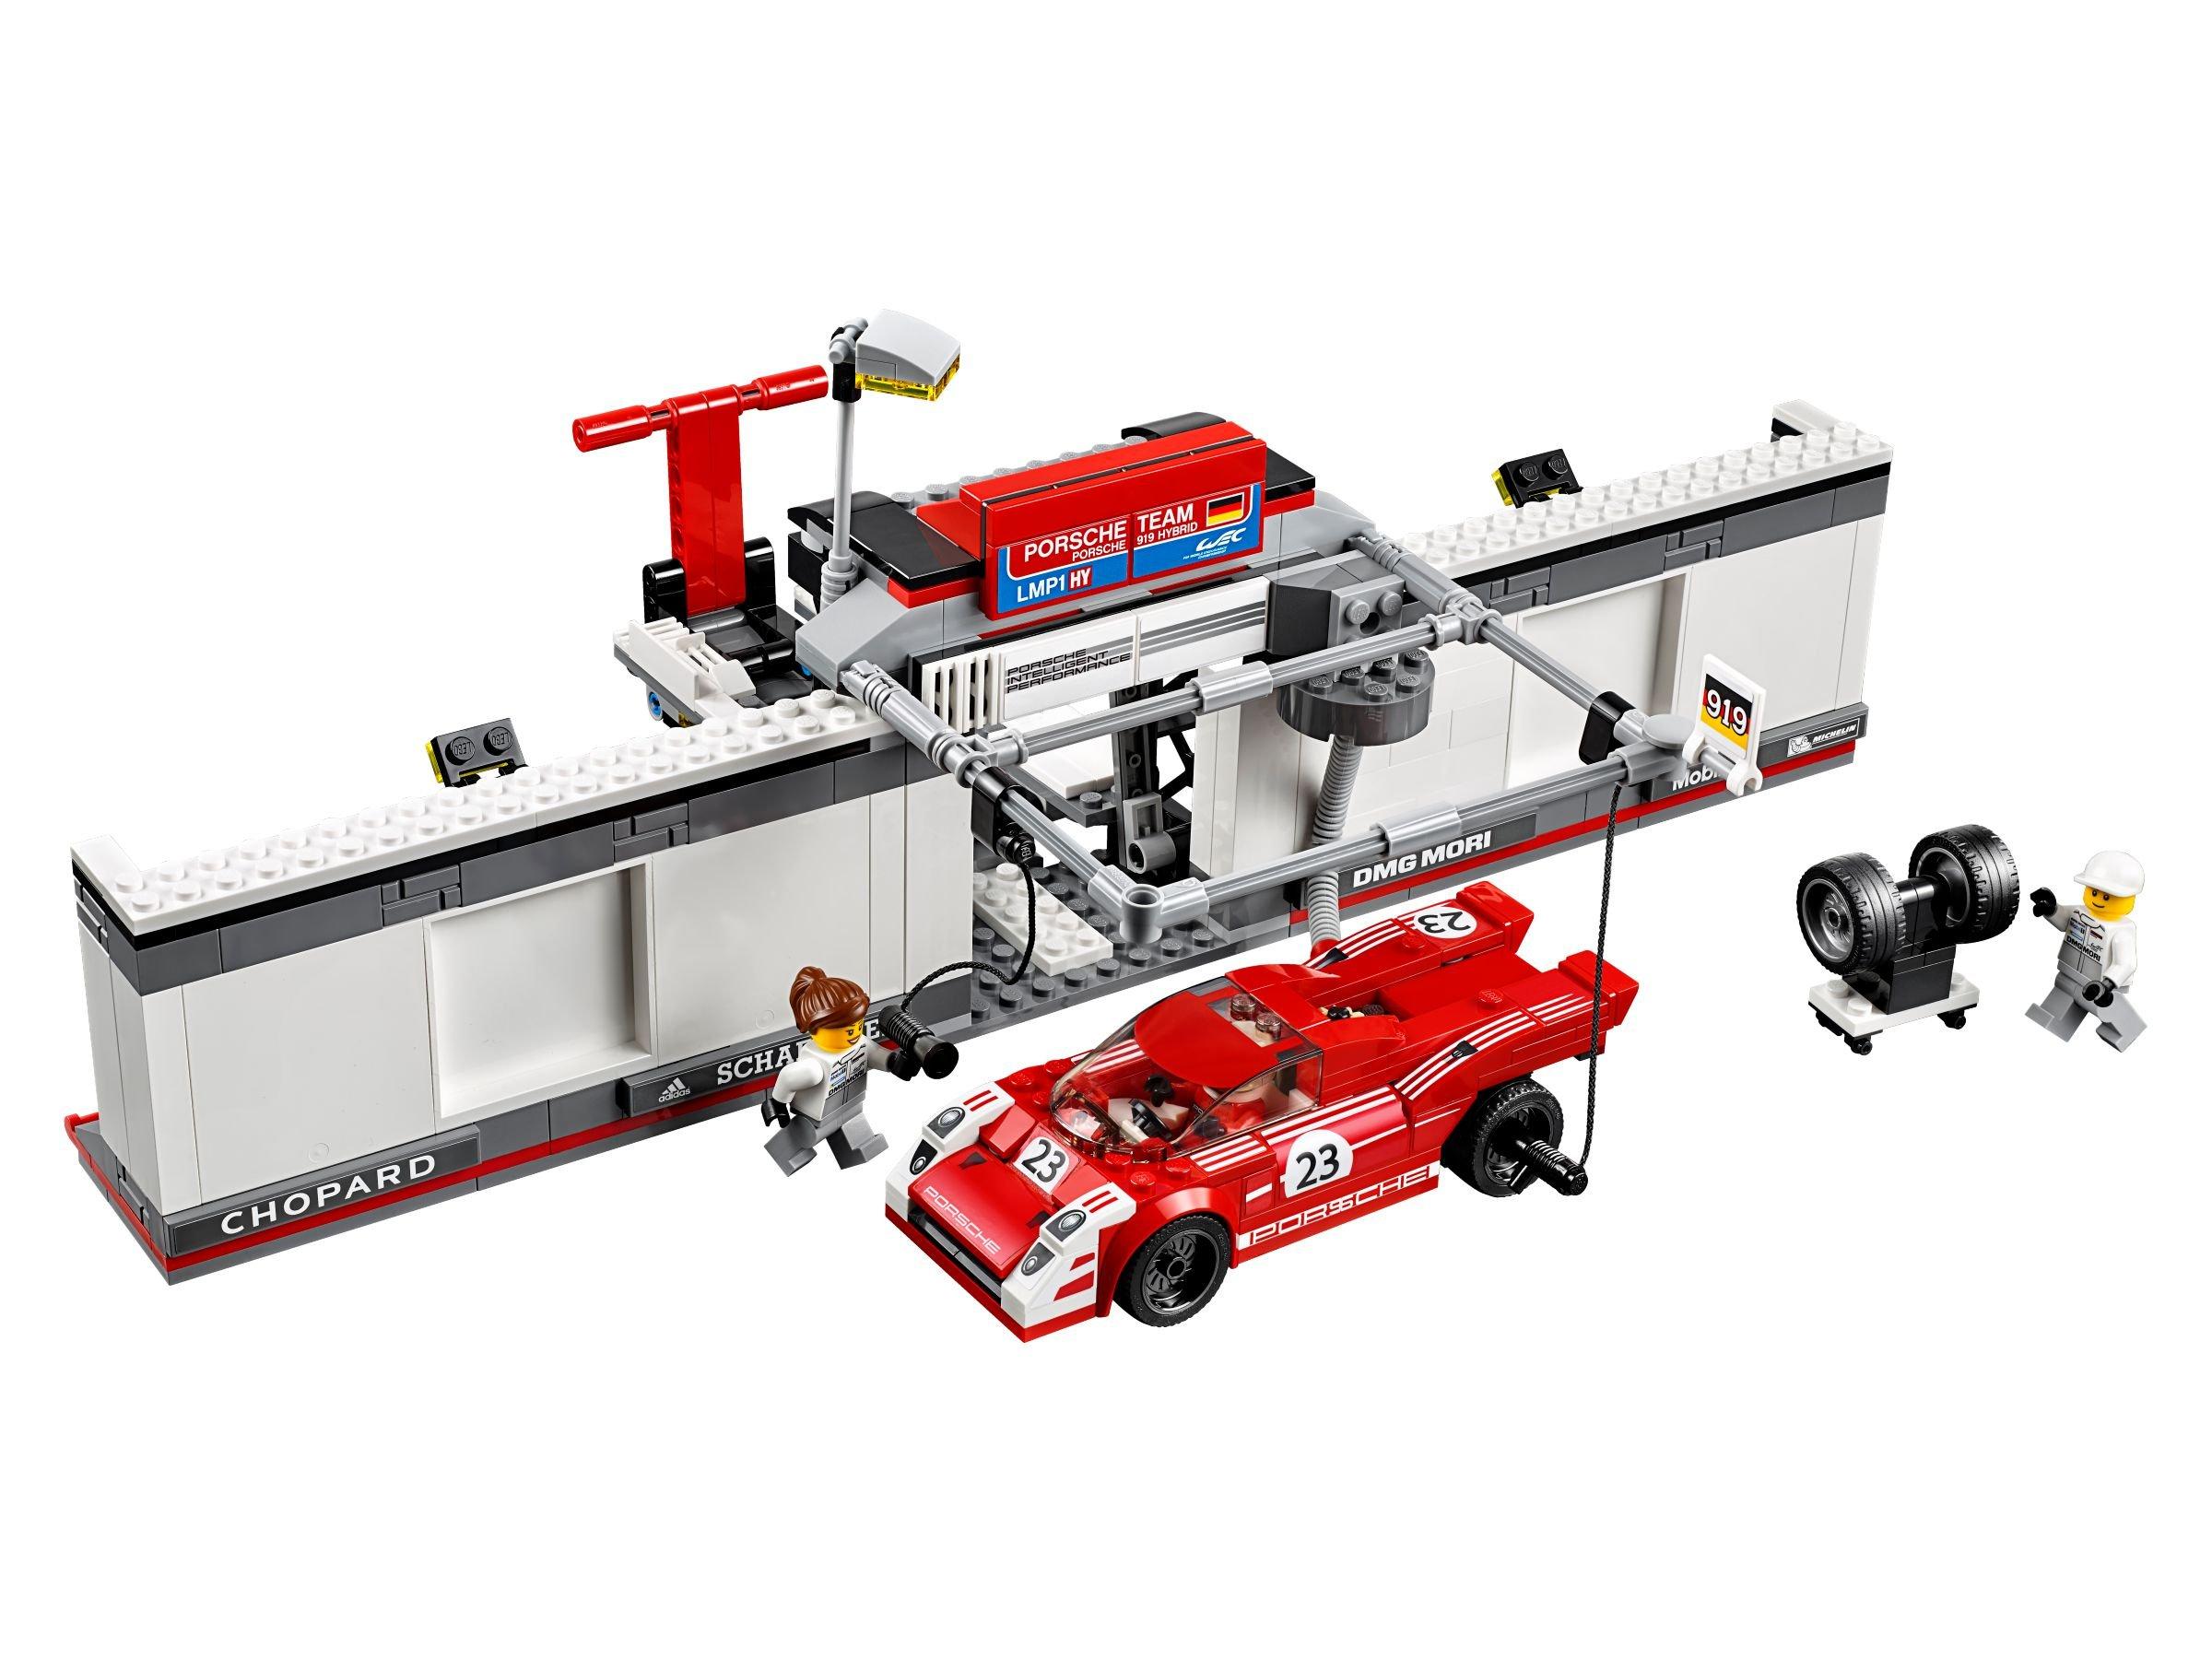 lego 75876 porsche 919 hybrid and 917k pit lane speed champions 2016 brickmerge. Black Bedroom Furniture Sets. Home Design Ideas